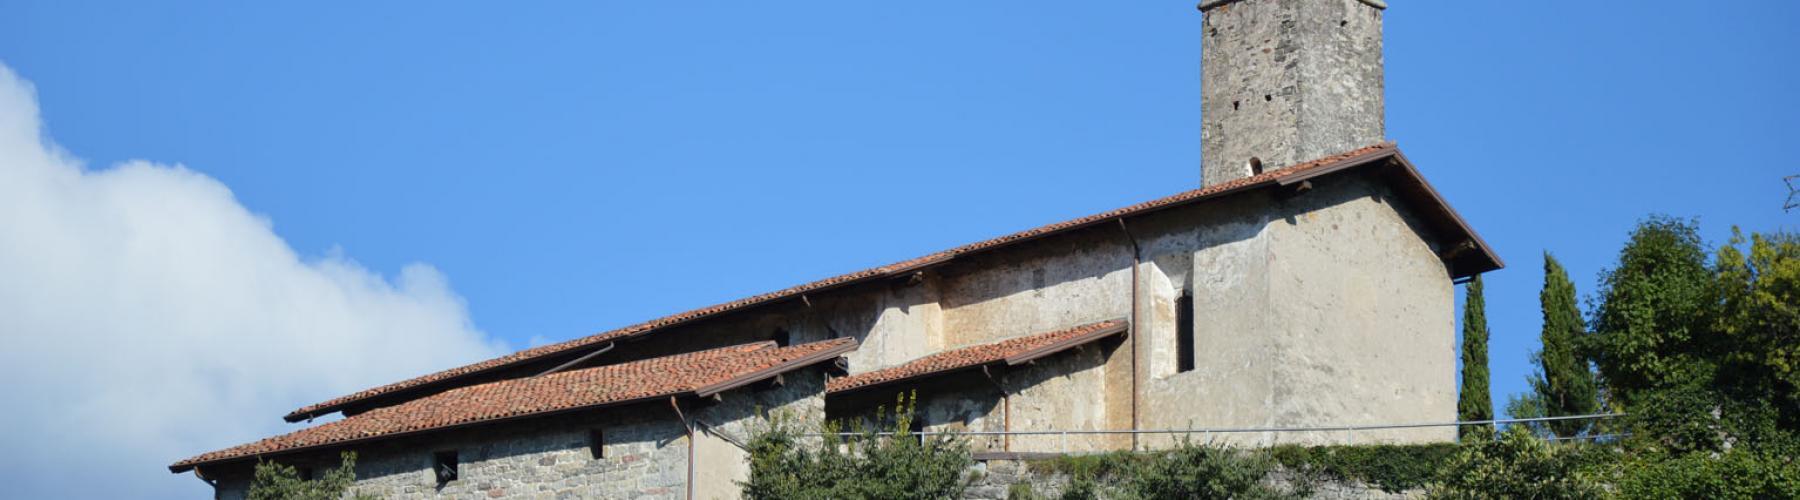 Copertina Chiesa di San Lorenzo a Berzo Inferiore